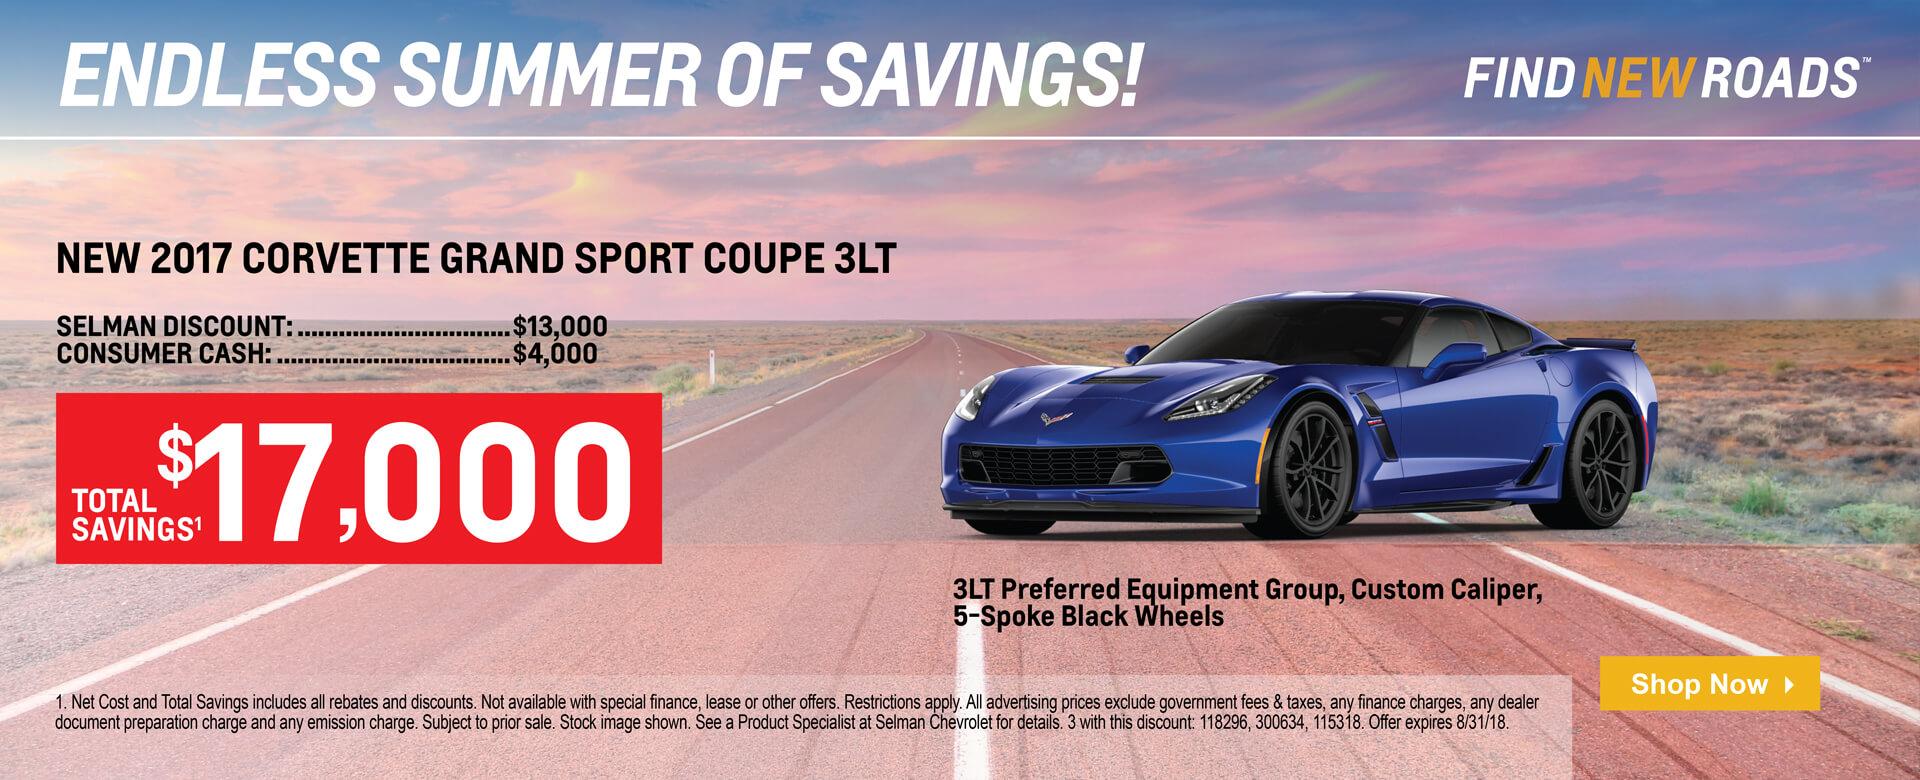 2017 Corvette Grand Sport $15000 savings